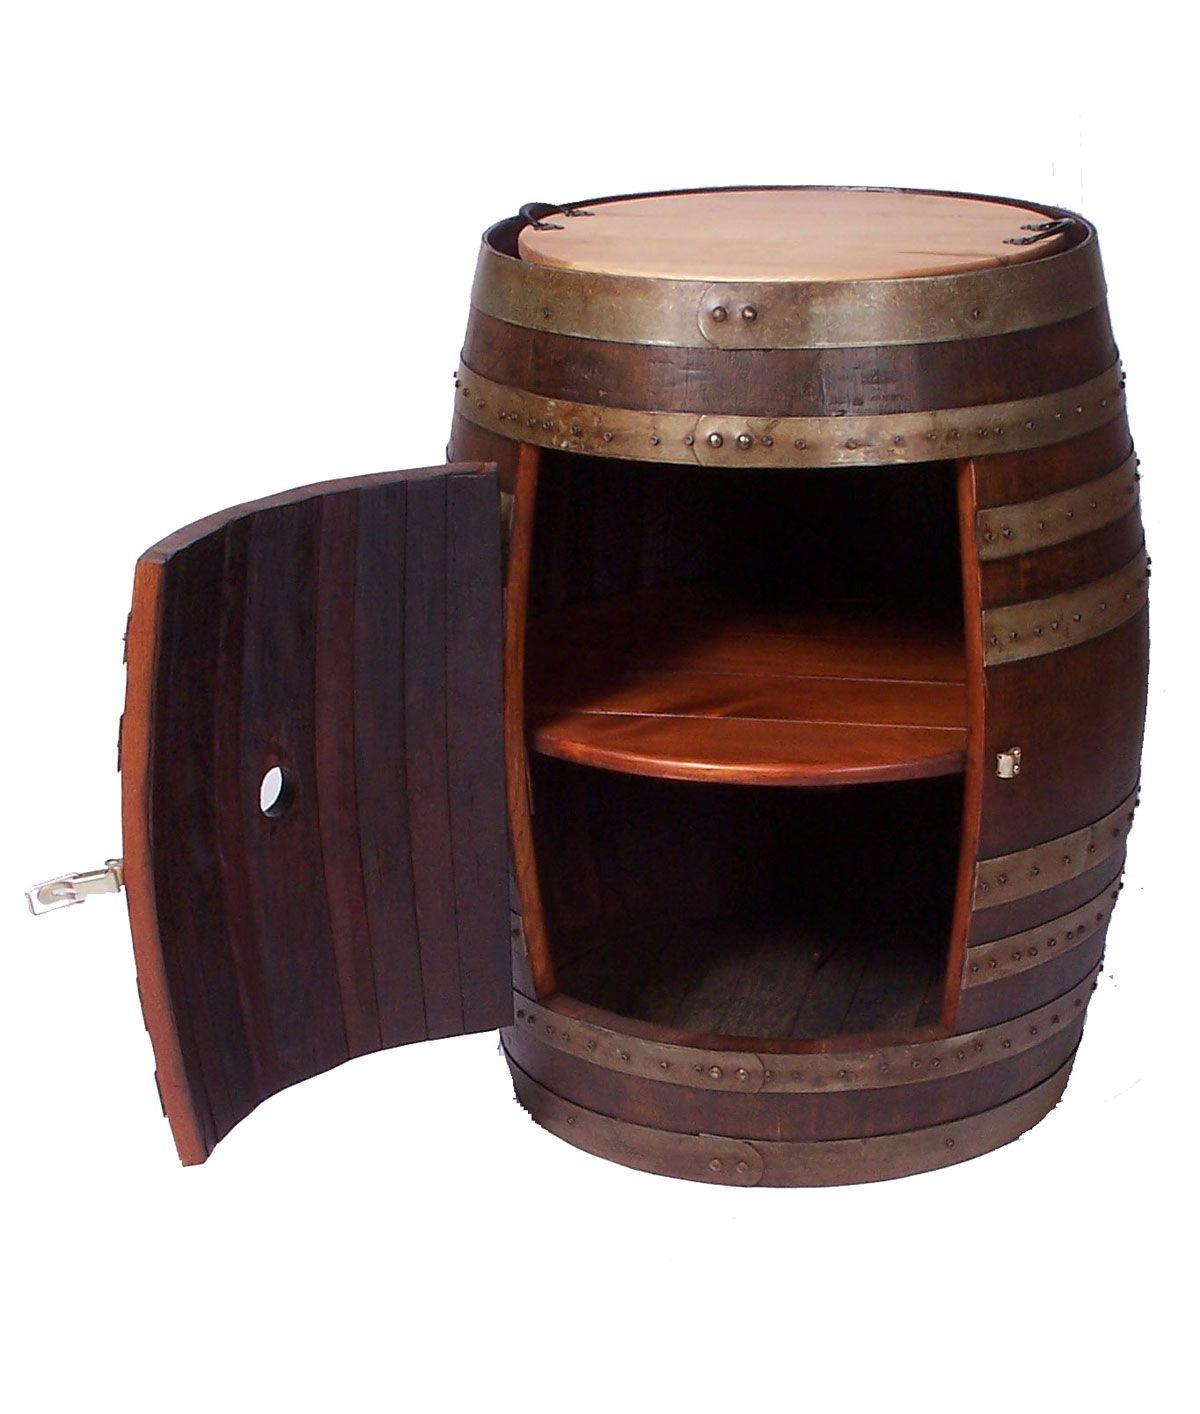 wine barrel bar plans. RECYCLED WINE BARREL SIDE CABINET | Recycled Wine Barrel Side Cabinet Is Handmade From Reclaimed Oak Bar Plans F